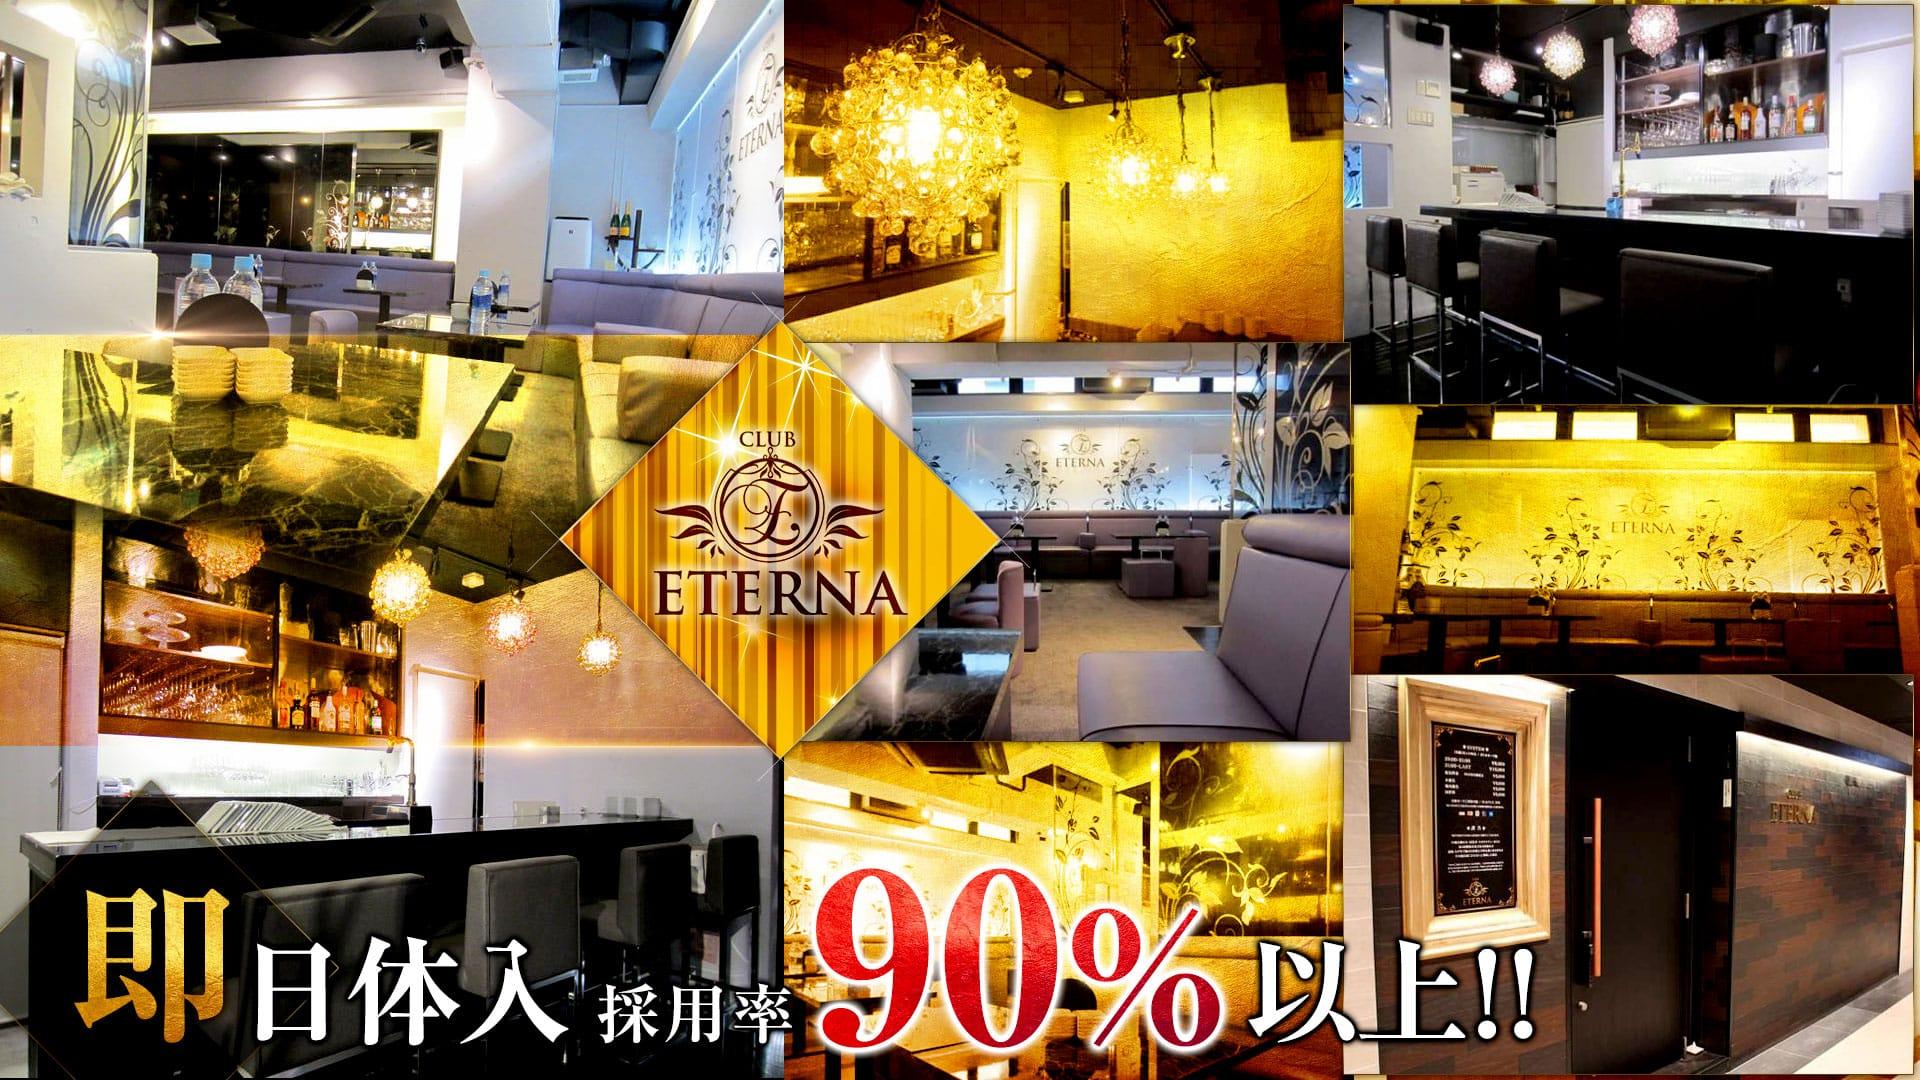 CLUB ETERNA(エテルナ) TOP画像